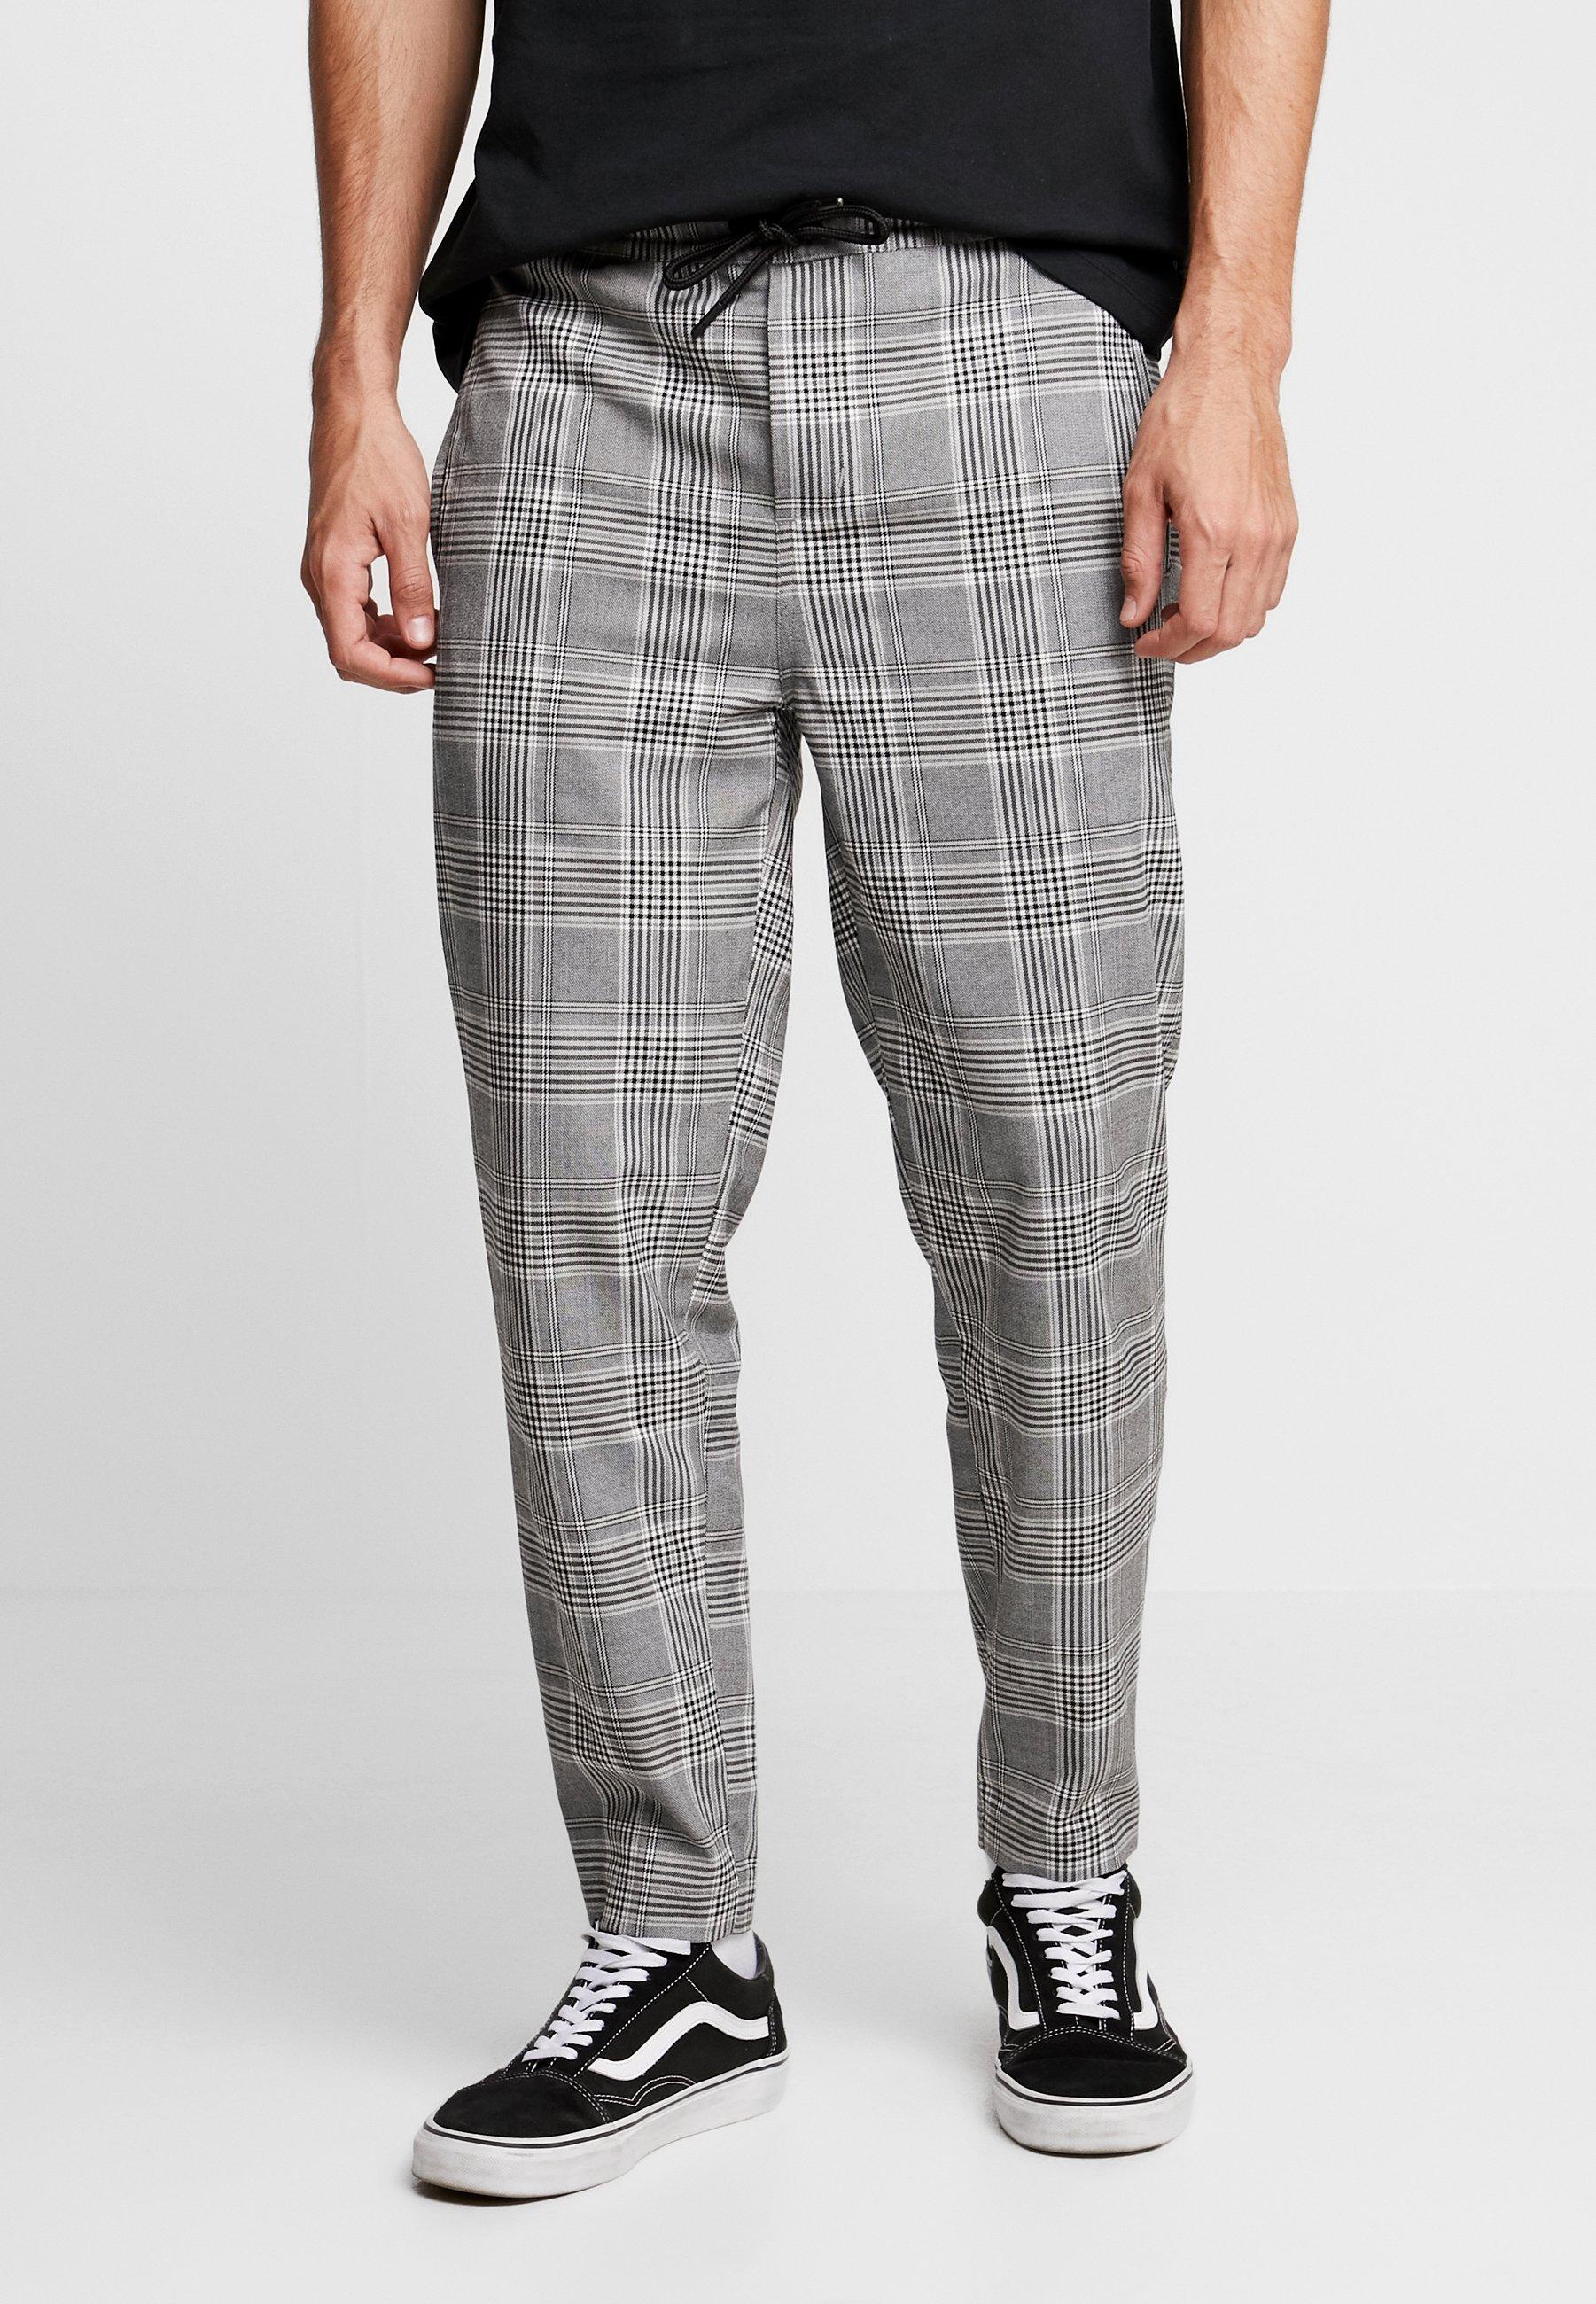 Uomo CROPPED COMFORT GLENCHECK PANTS - Pantaloni